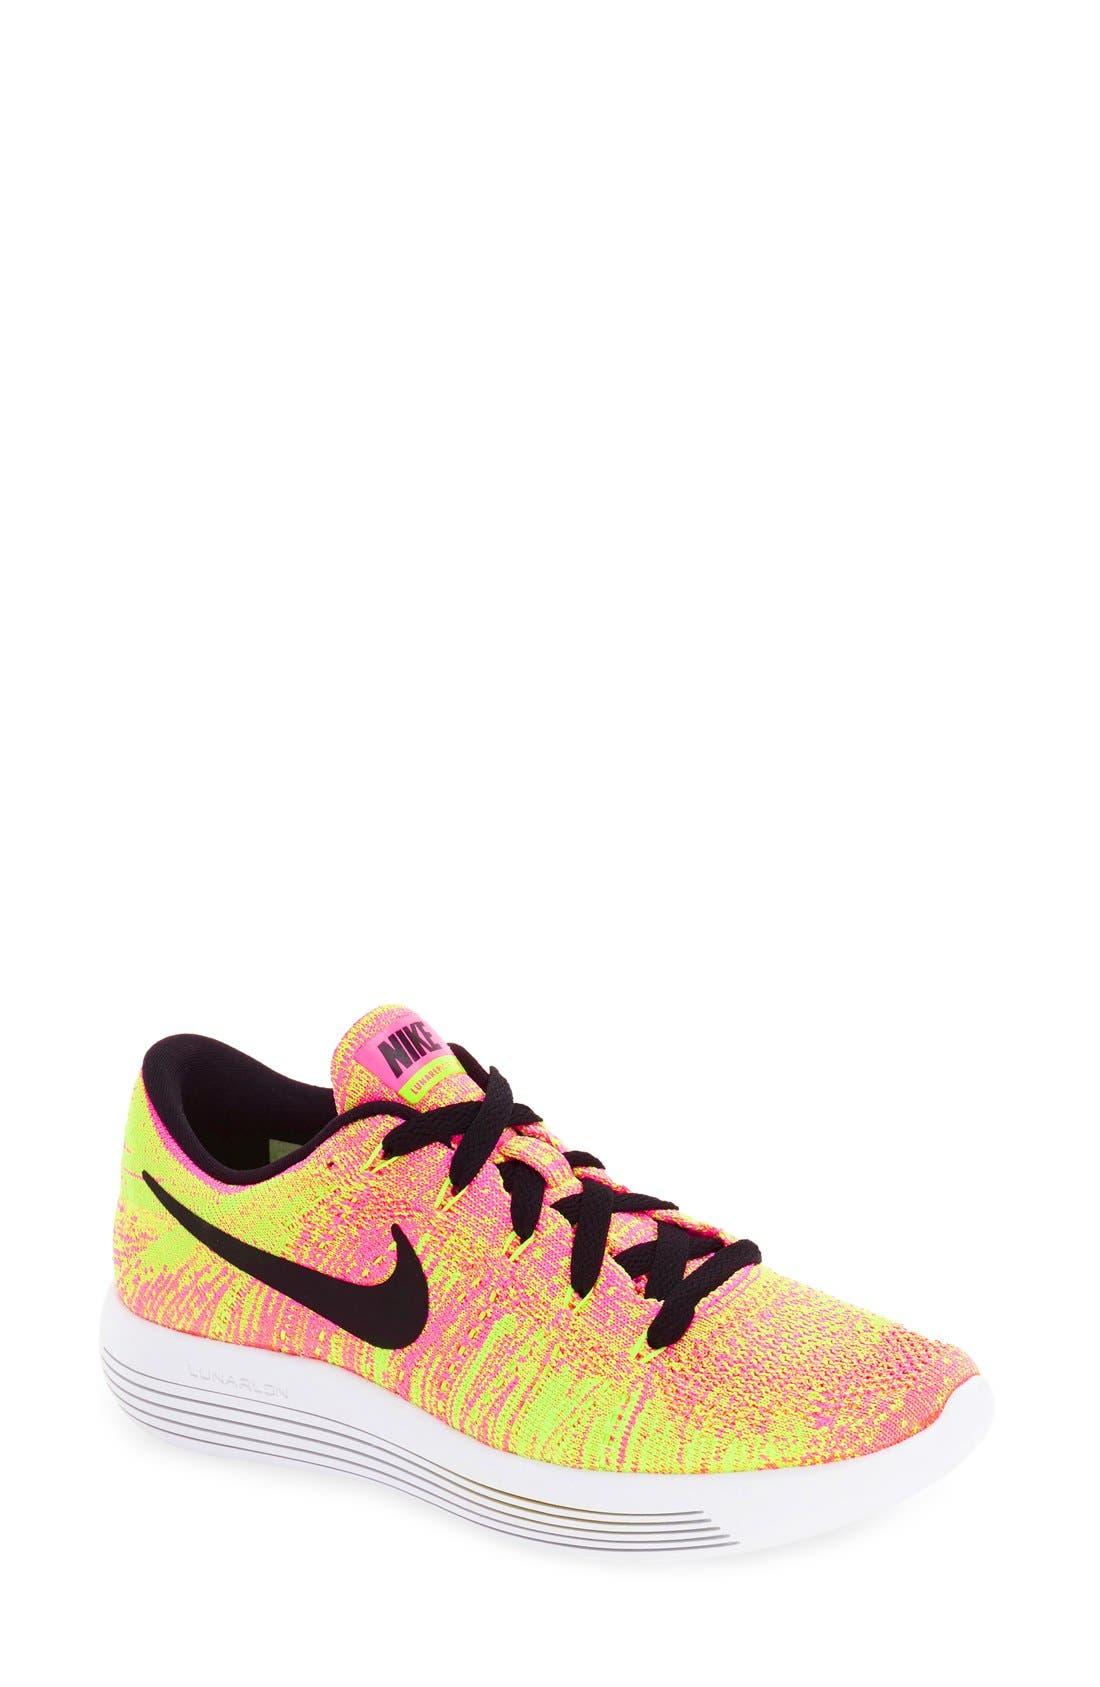 Alternate Image 1 Selected - Nike 'Flyknit LunarEpic' Running Shoe (Women)